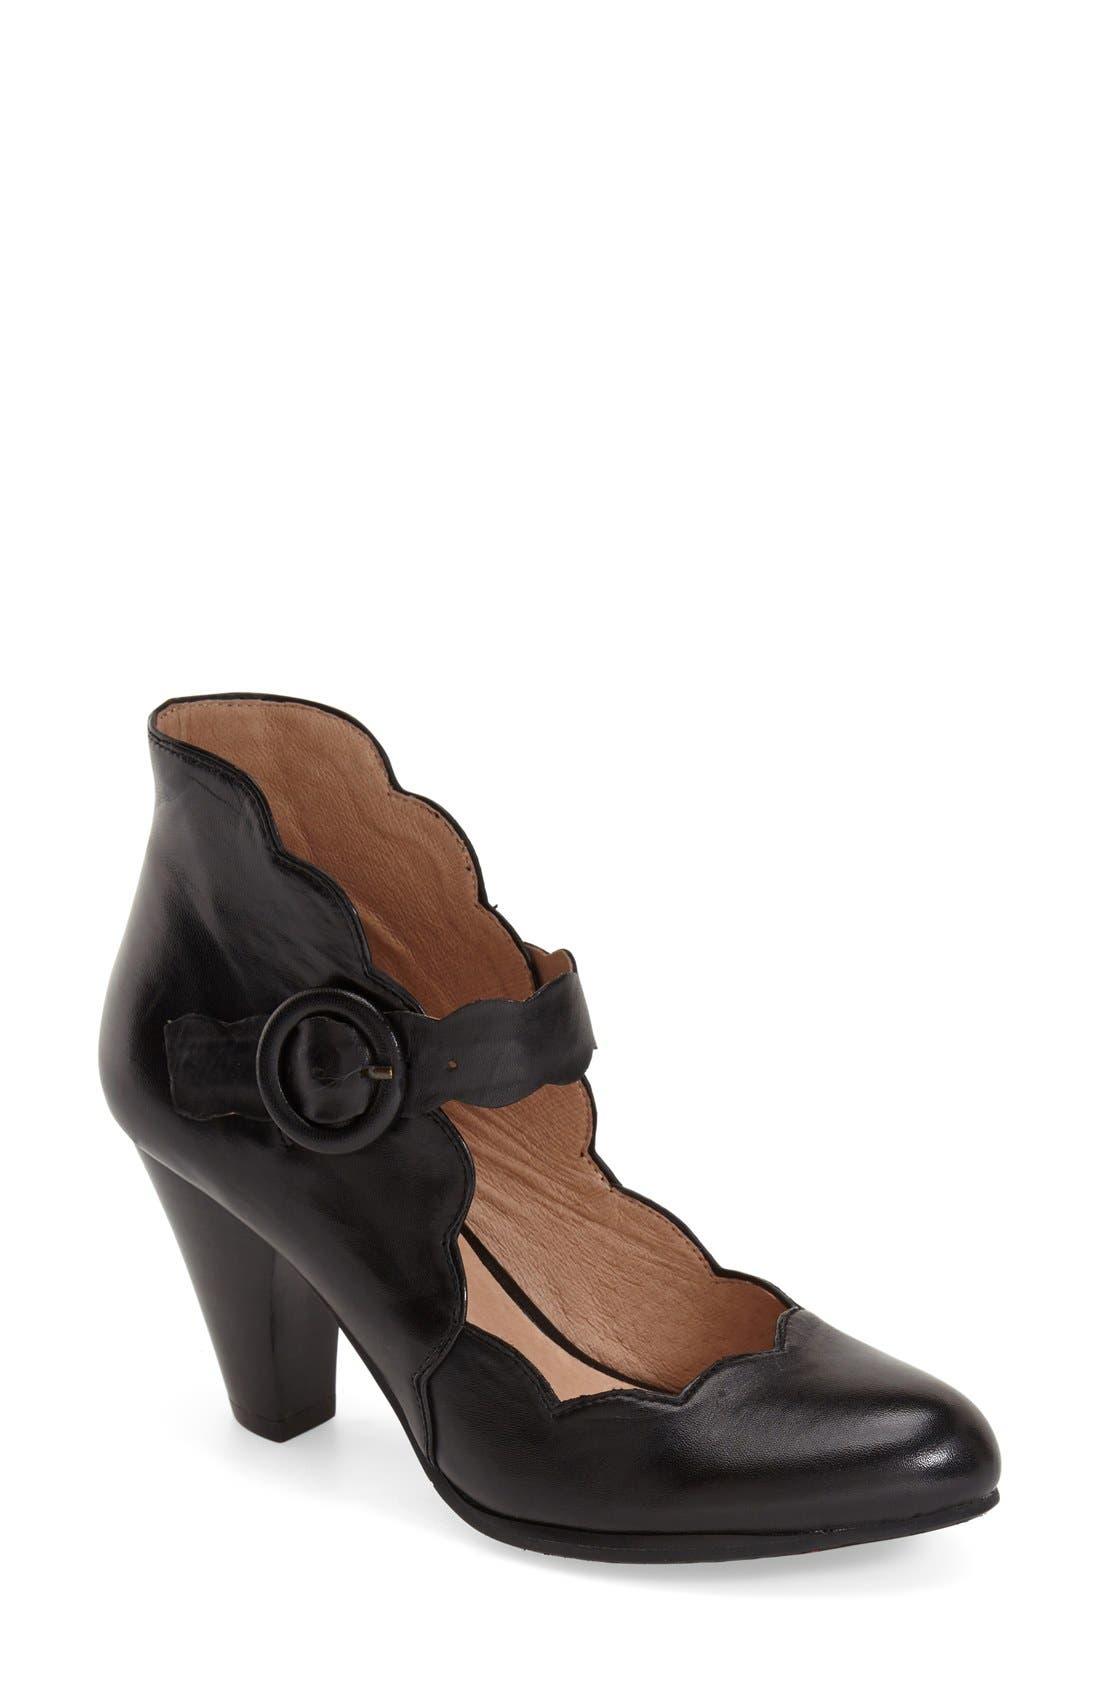 Main Image - Miz Mooz Footwear 'Carissa' Mary Jane Pump (Women)